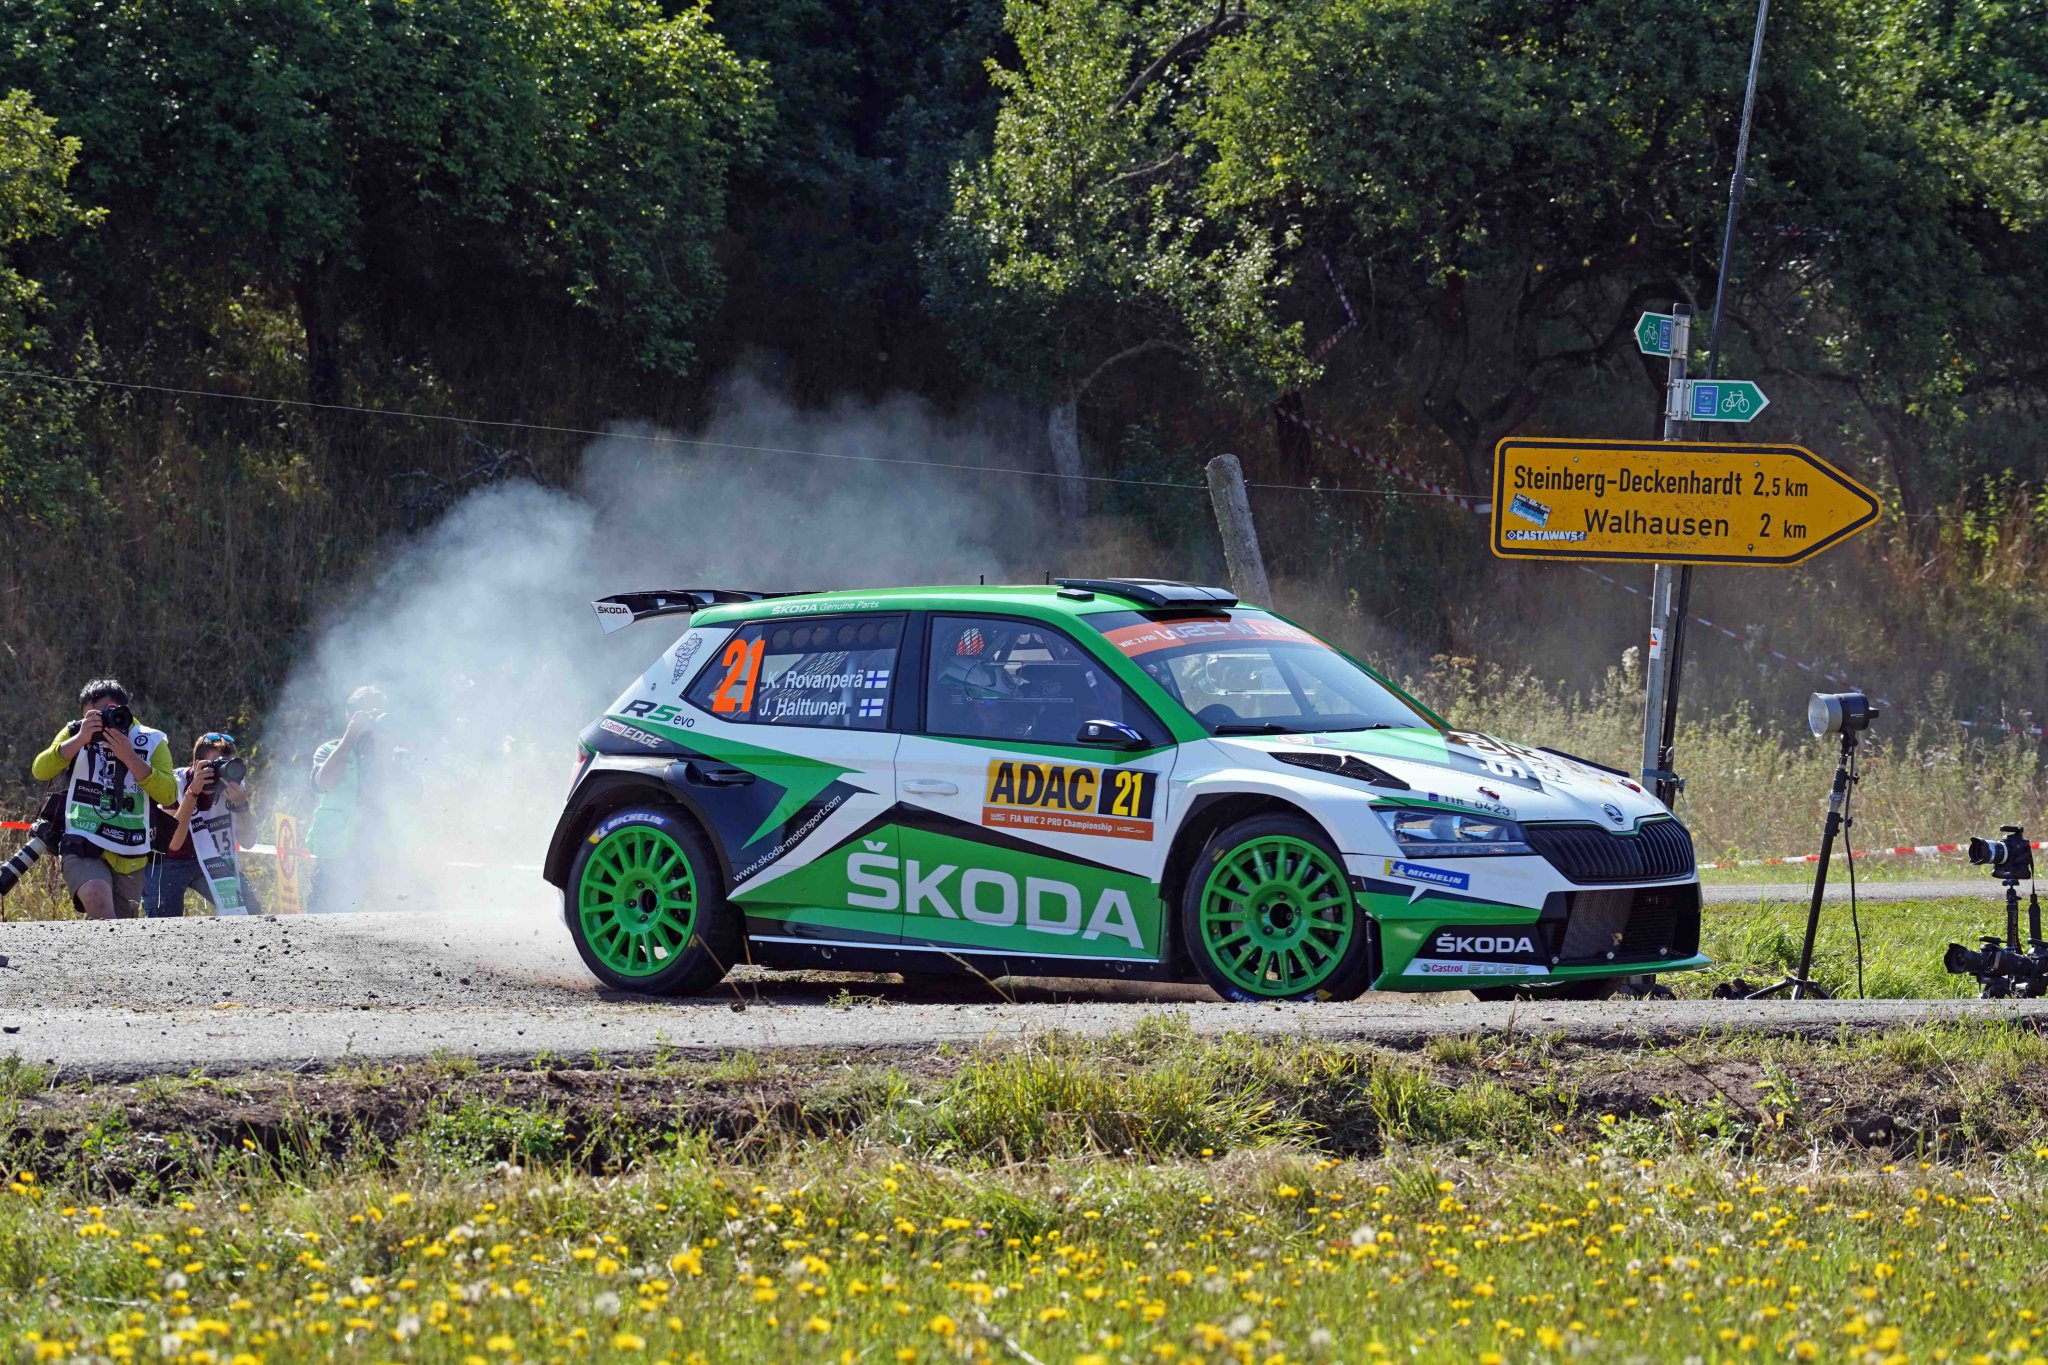 WRC: ADAC Rallye Deutschland [22-25 Agosto] - Página 4 ECkTlD3WwAEH3q1